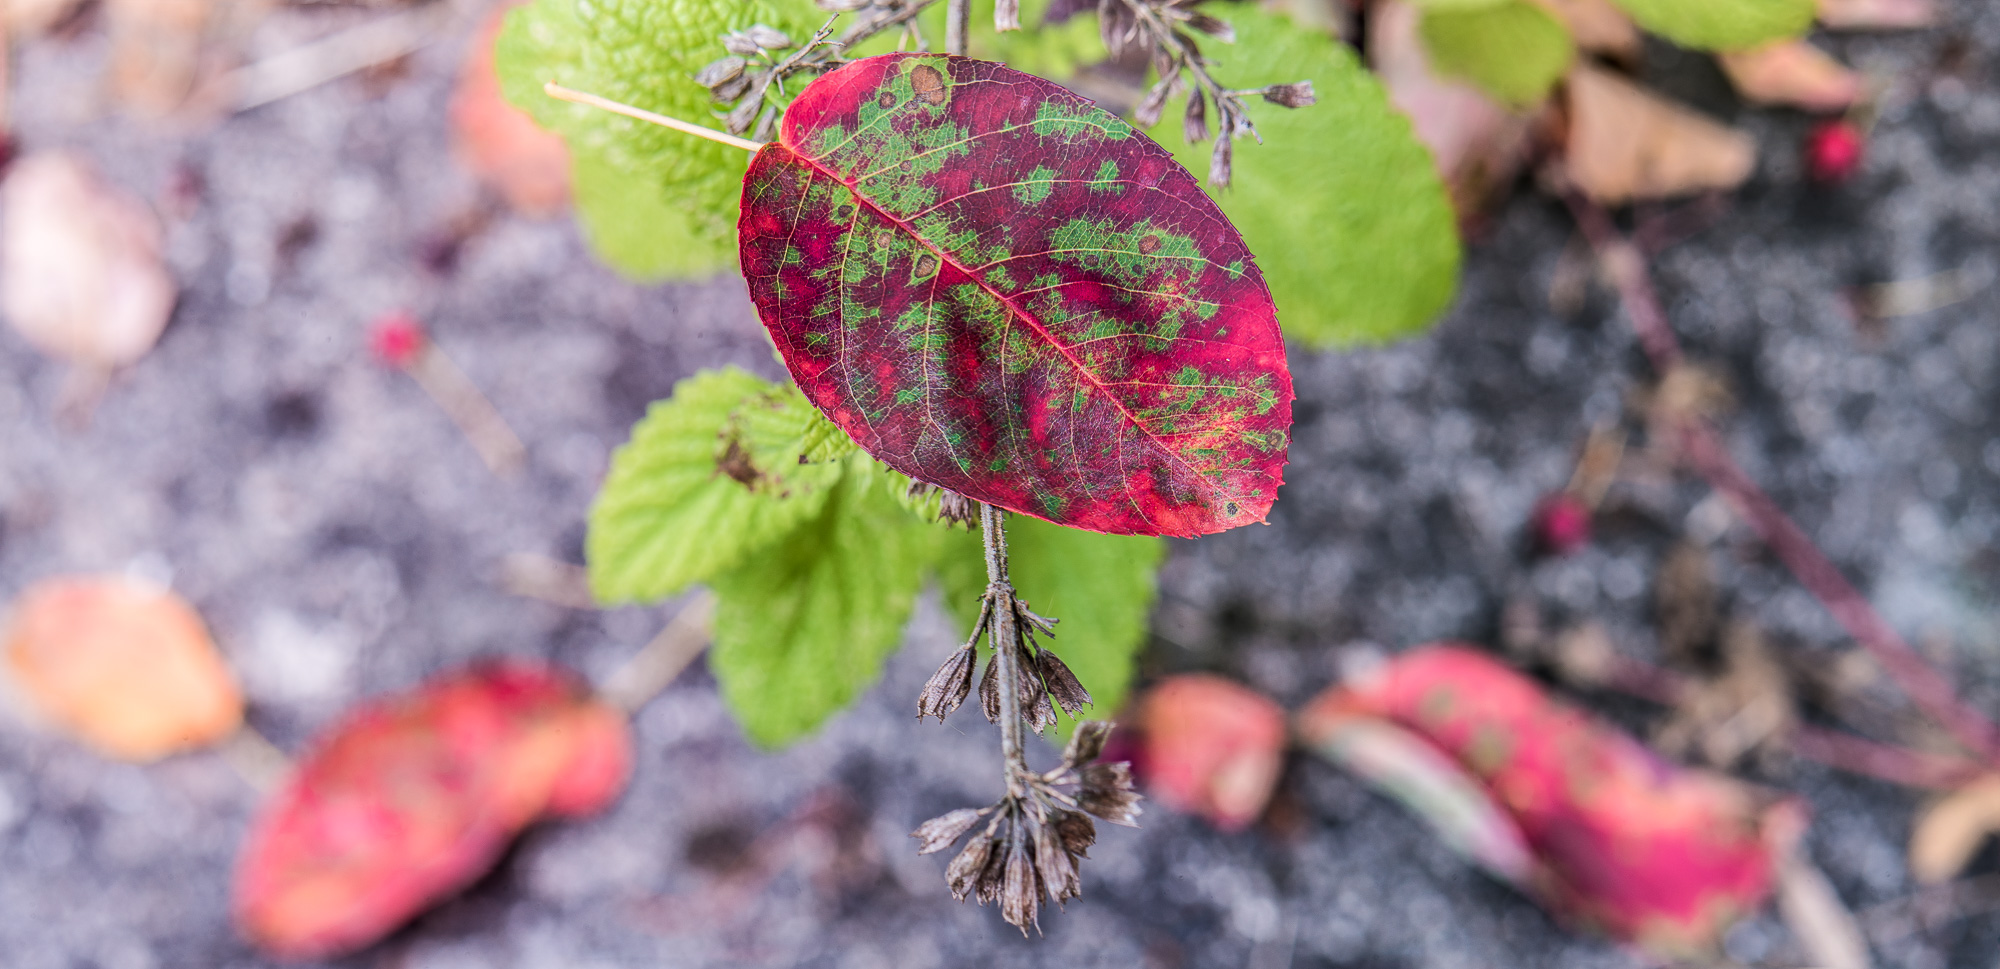 rot gefärbtes Blatt einer Felsenbirne